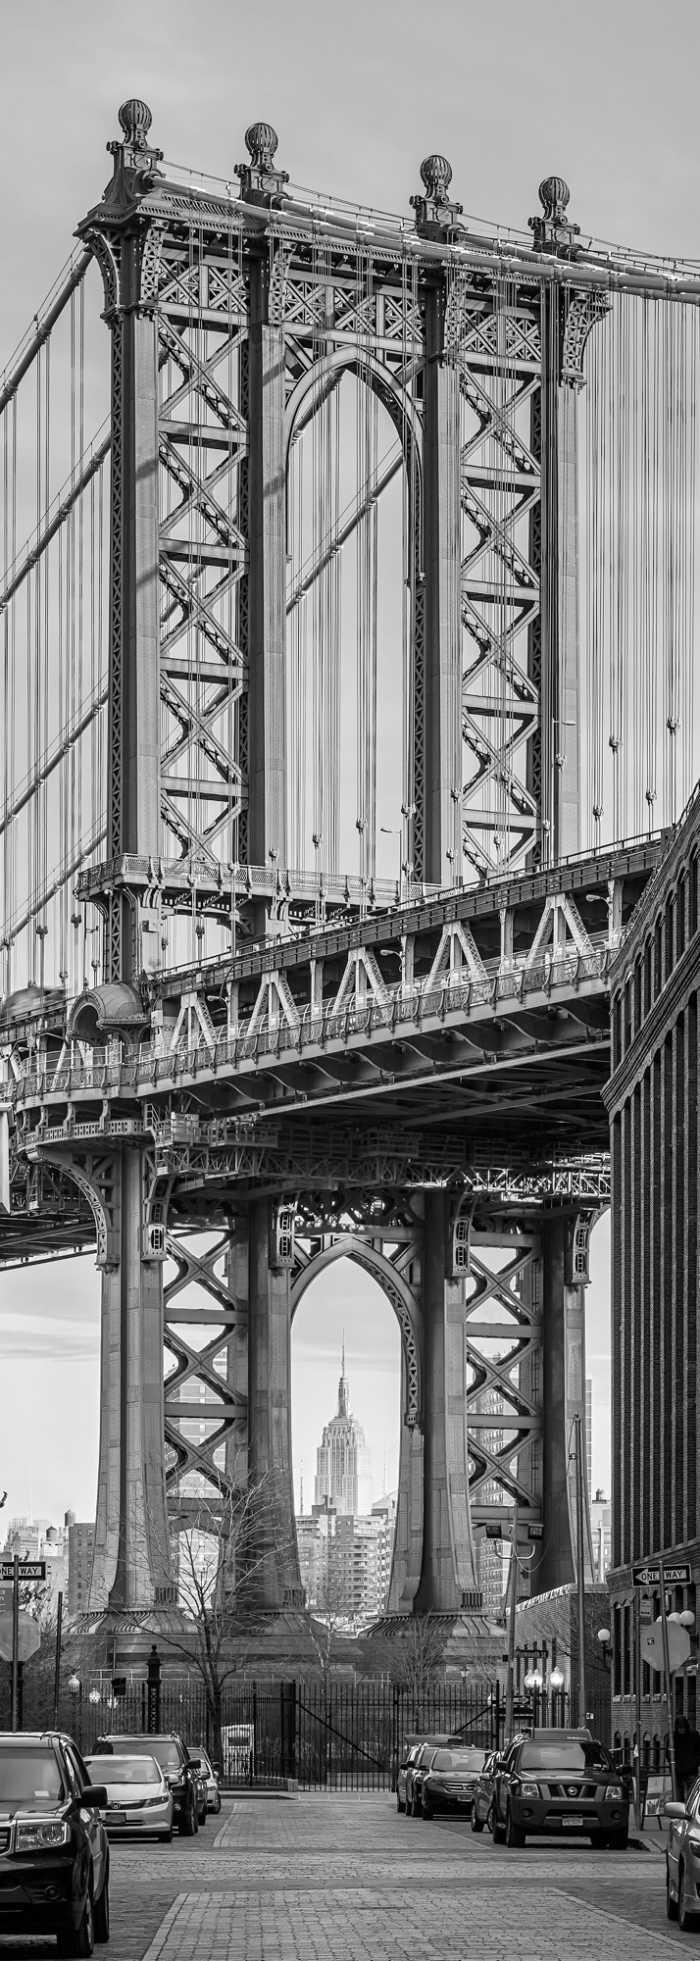 Panel Brooklyn View